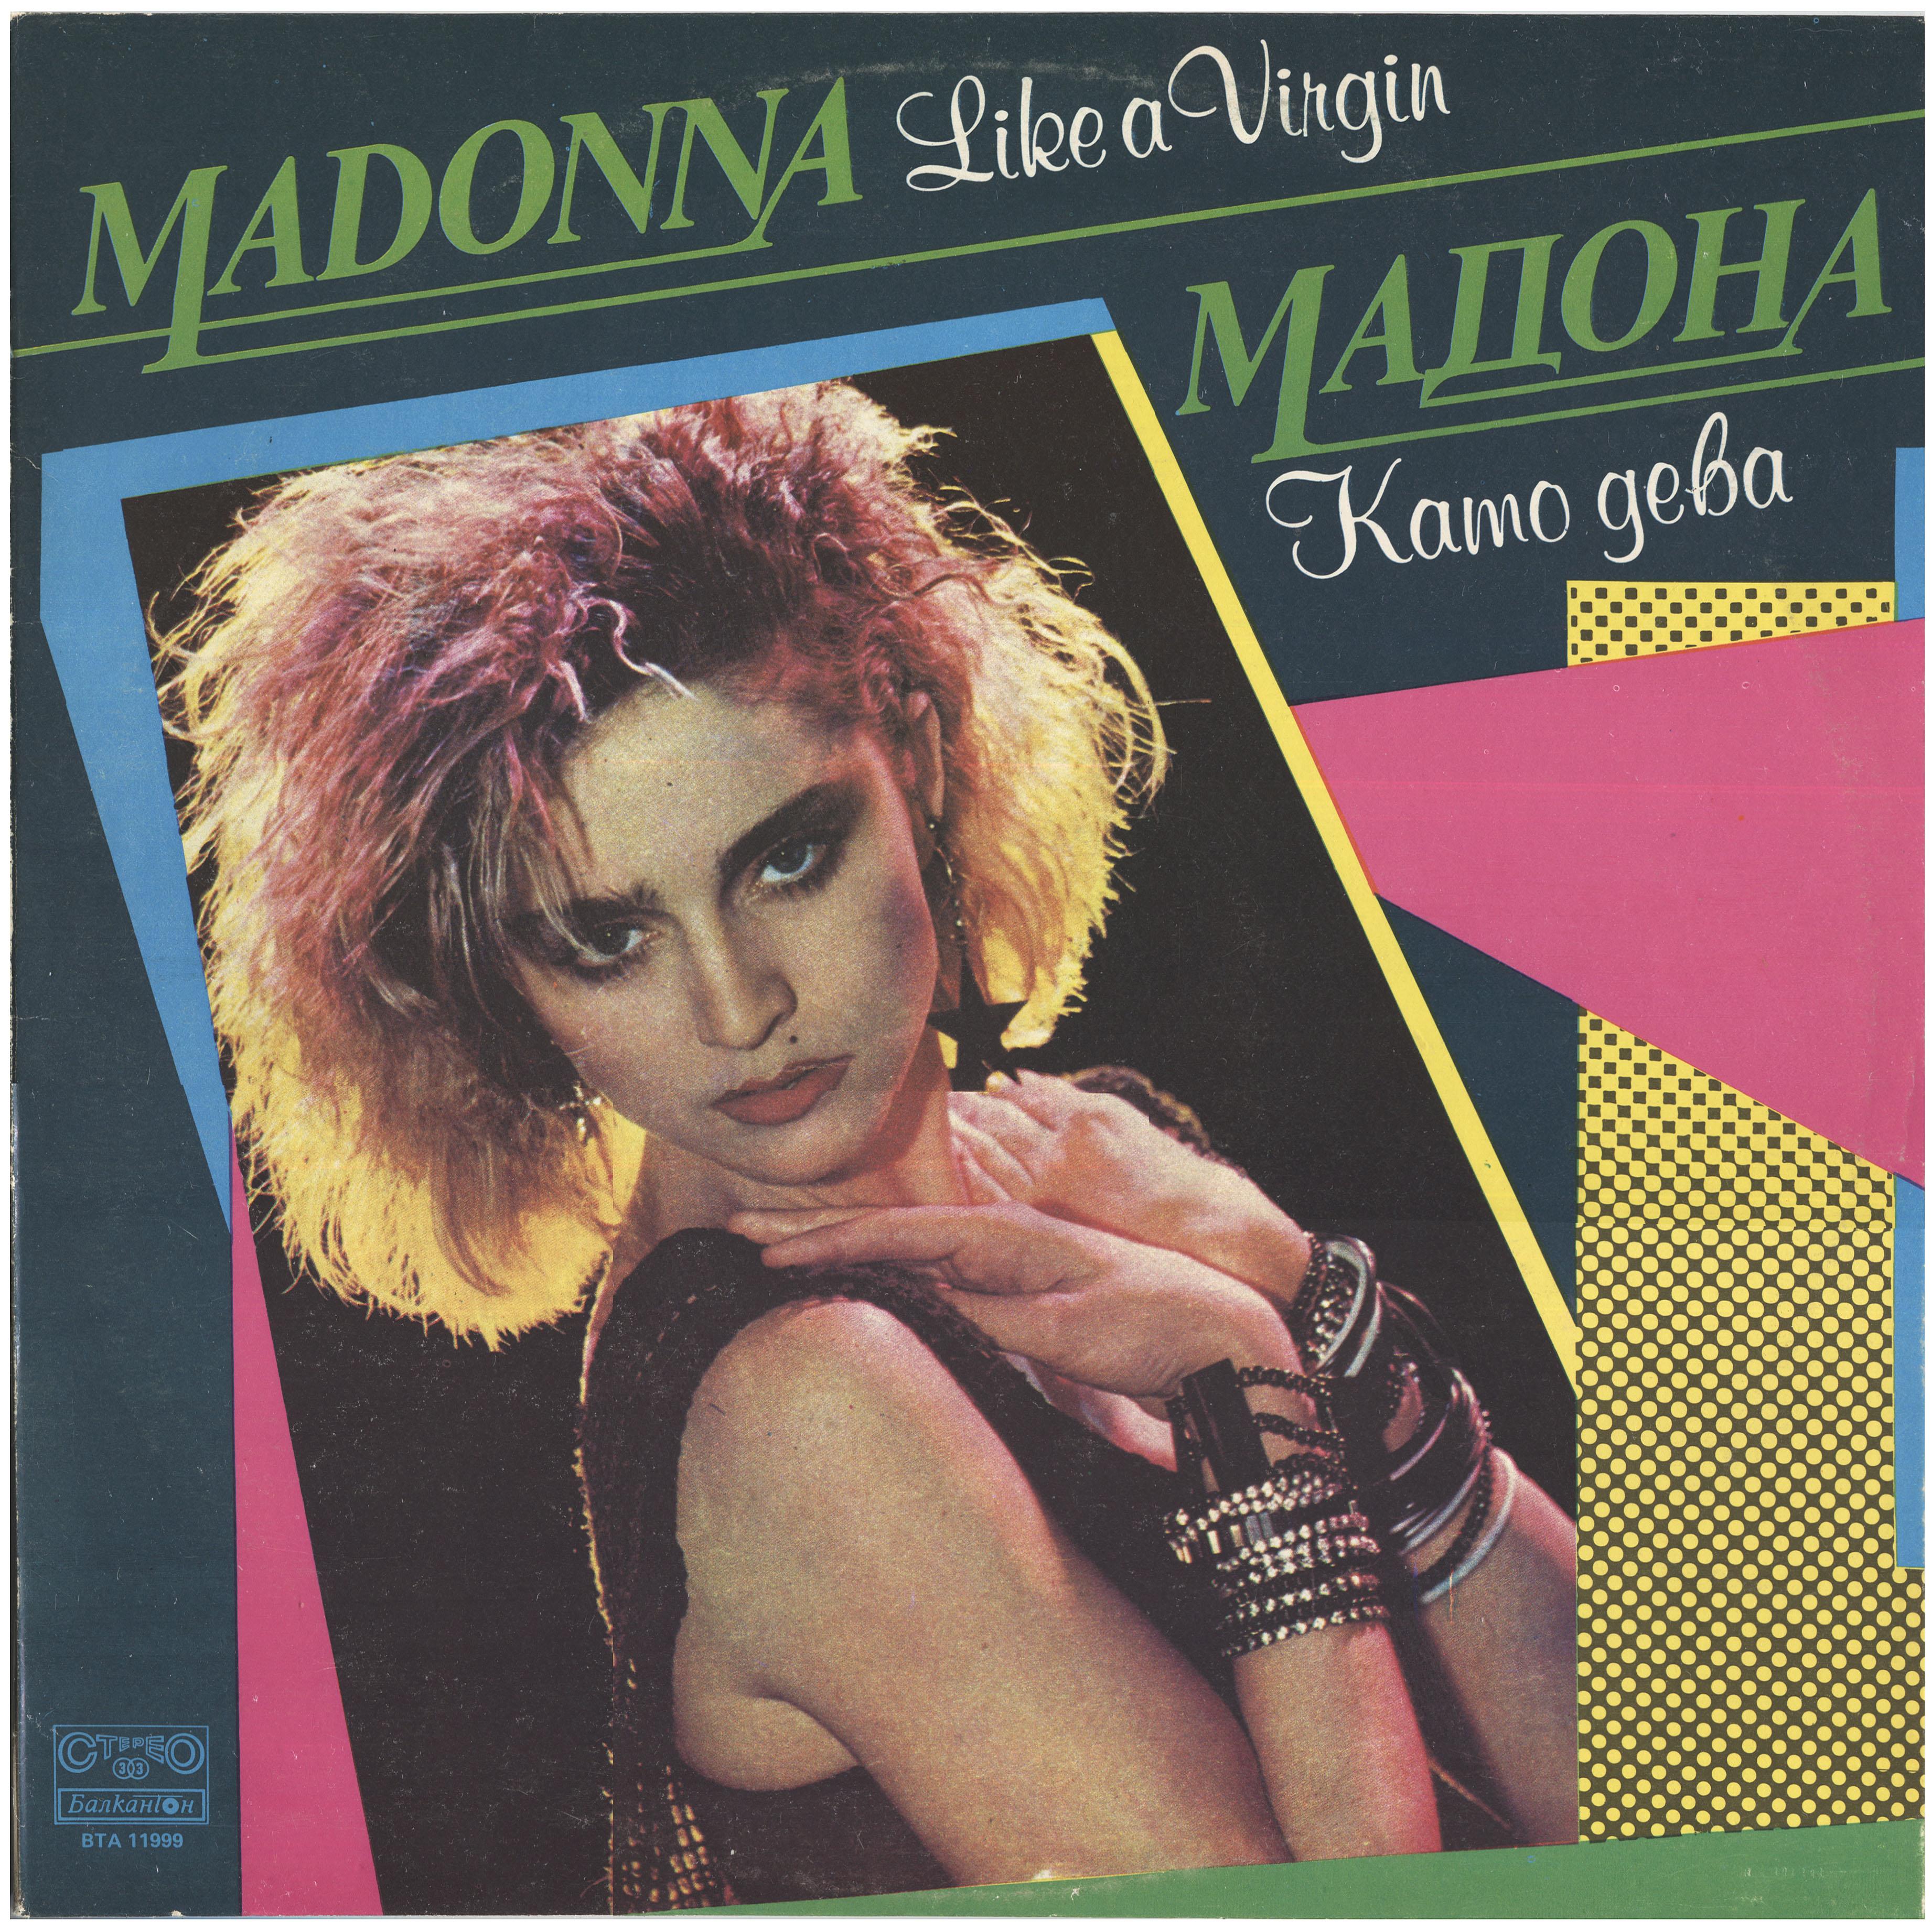 Madonna84LikeAVirgin_front.jpg